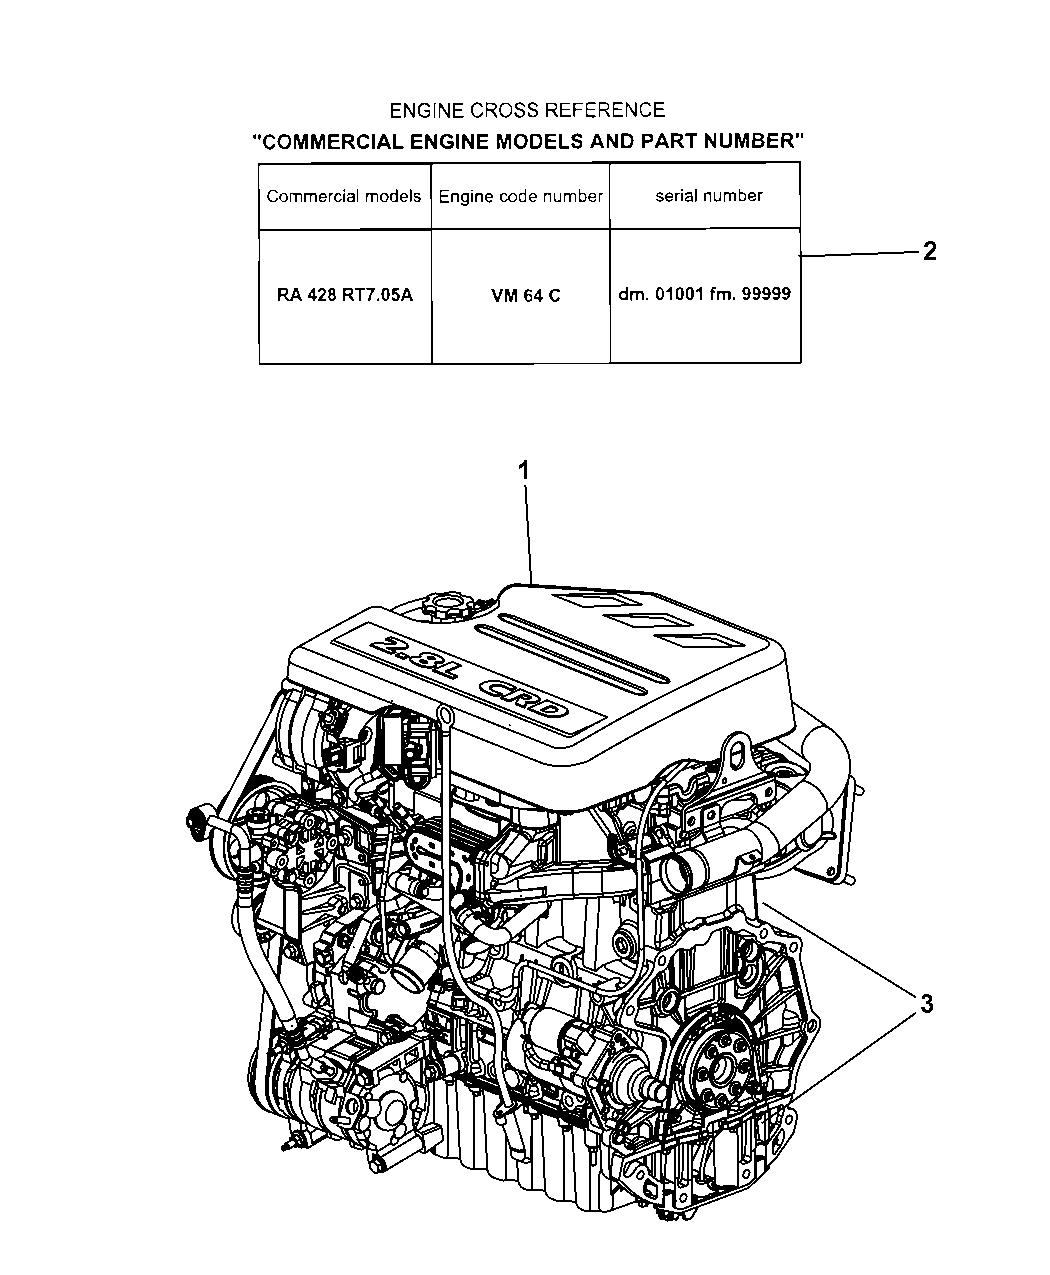 2008 Jeep Wrangler Engine Assembly & Identification - Thumbnail 1